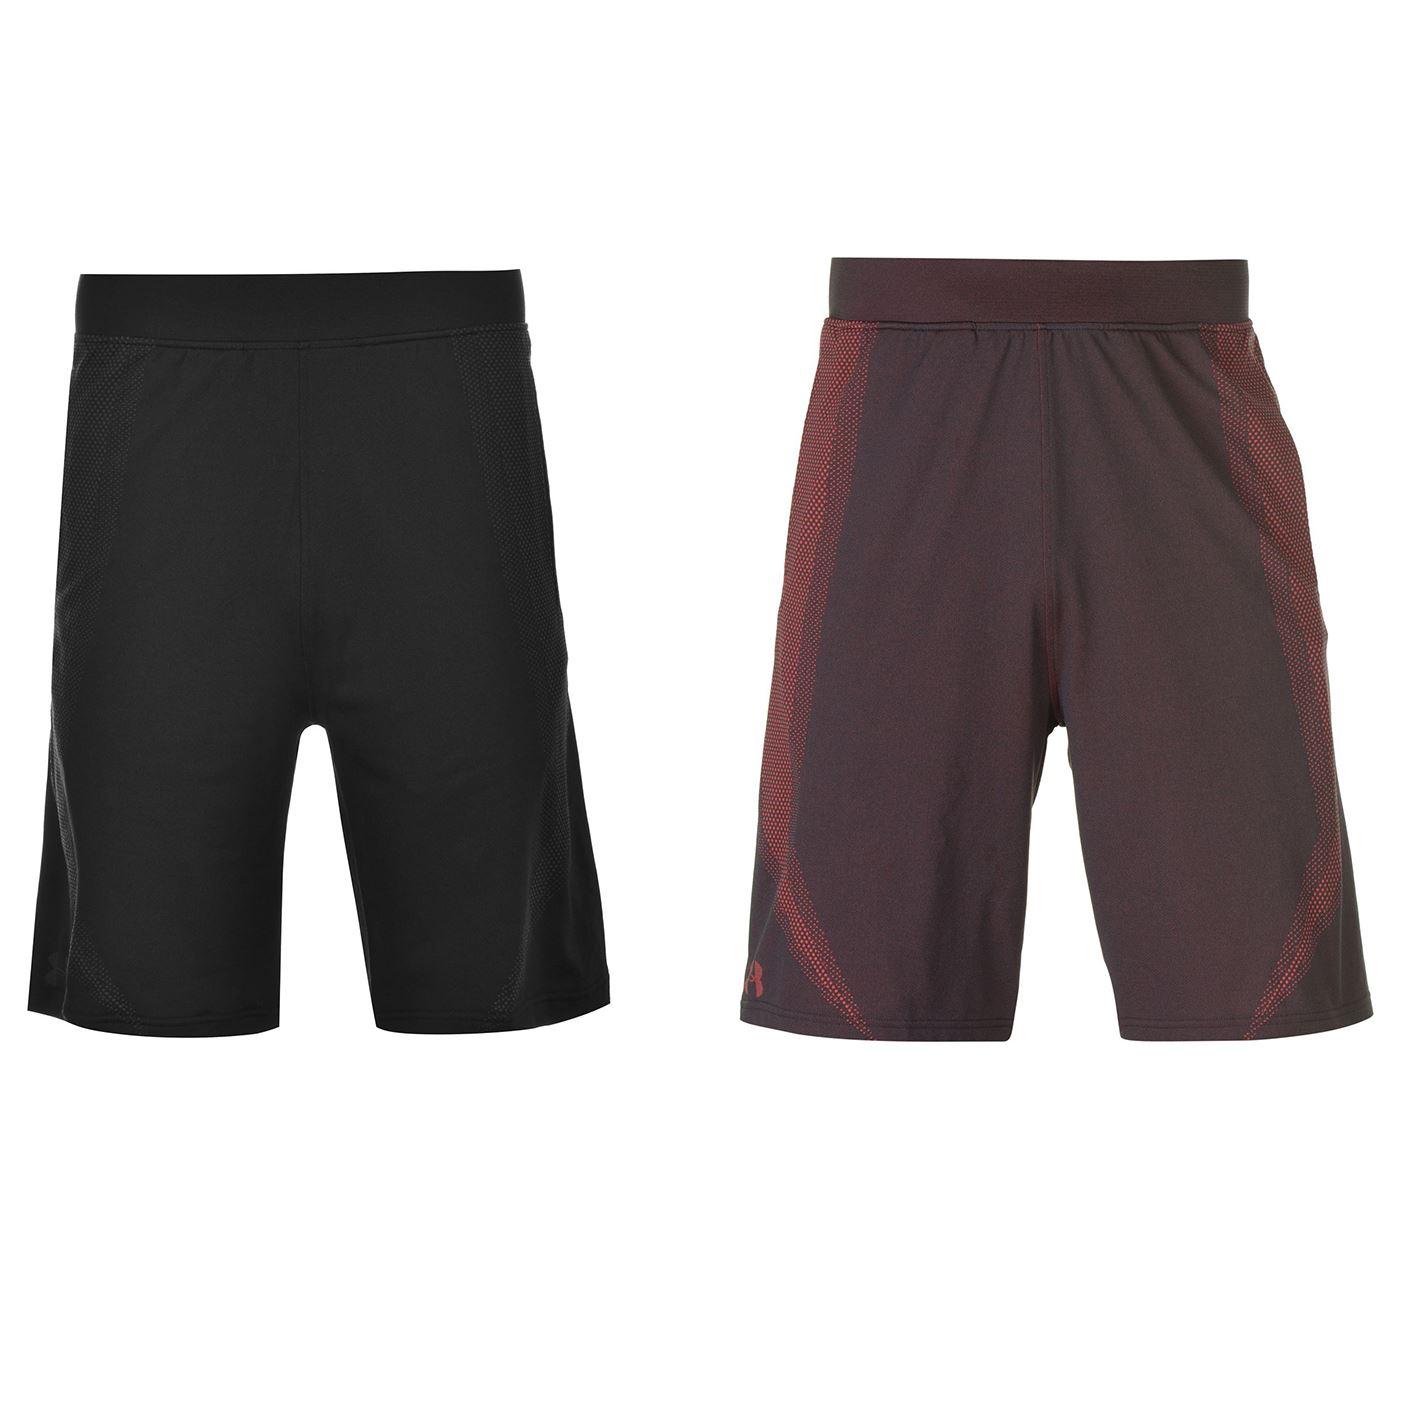 bb13a8f3 Details about Under Armour Threadborne Seamless Shorts Mens Bottoms Gym  Fitness Sportswear